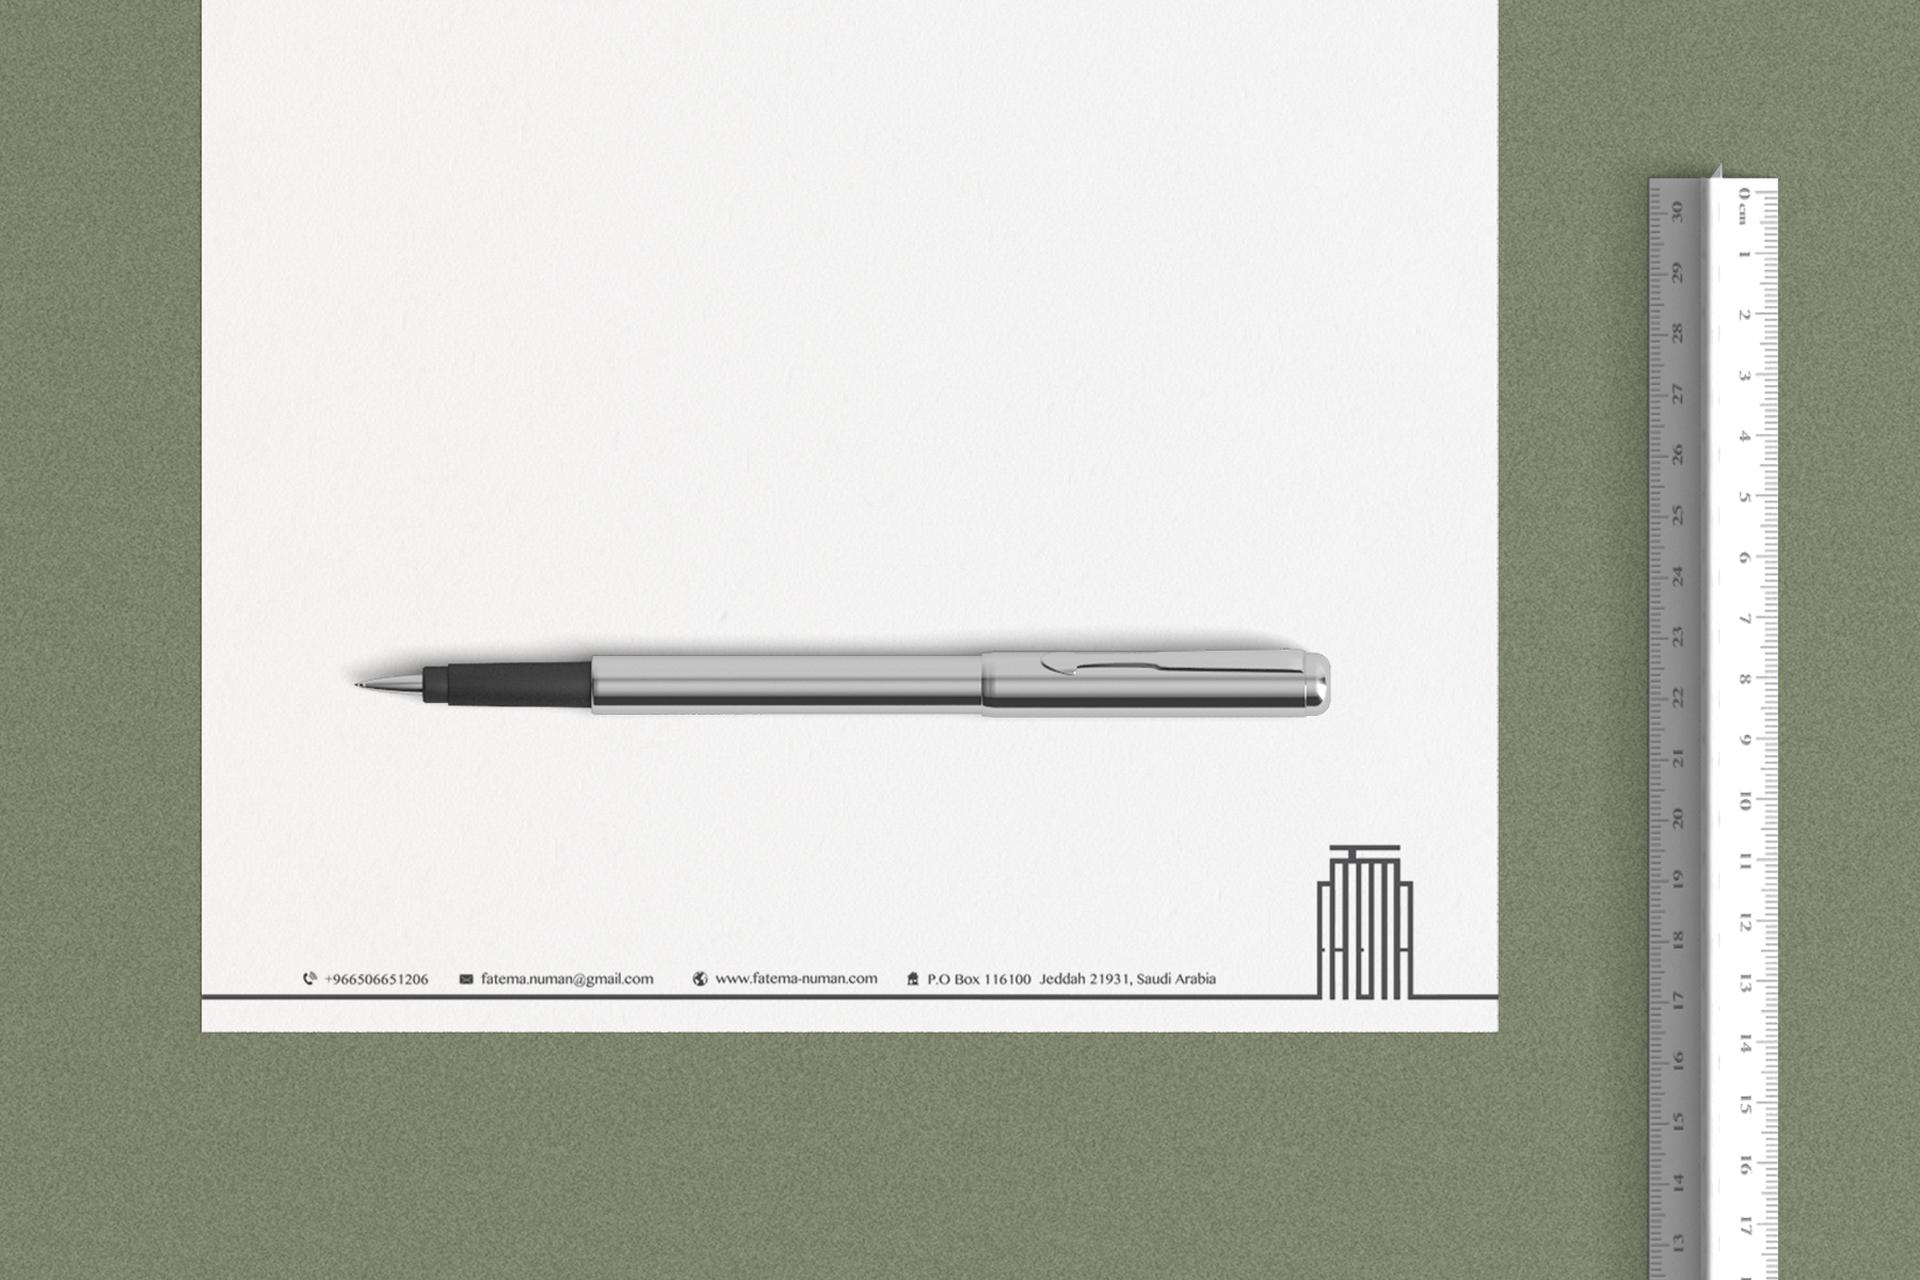 Mockup-stationery-06